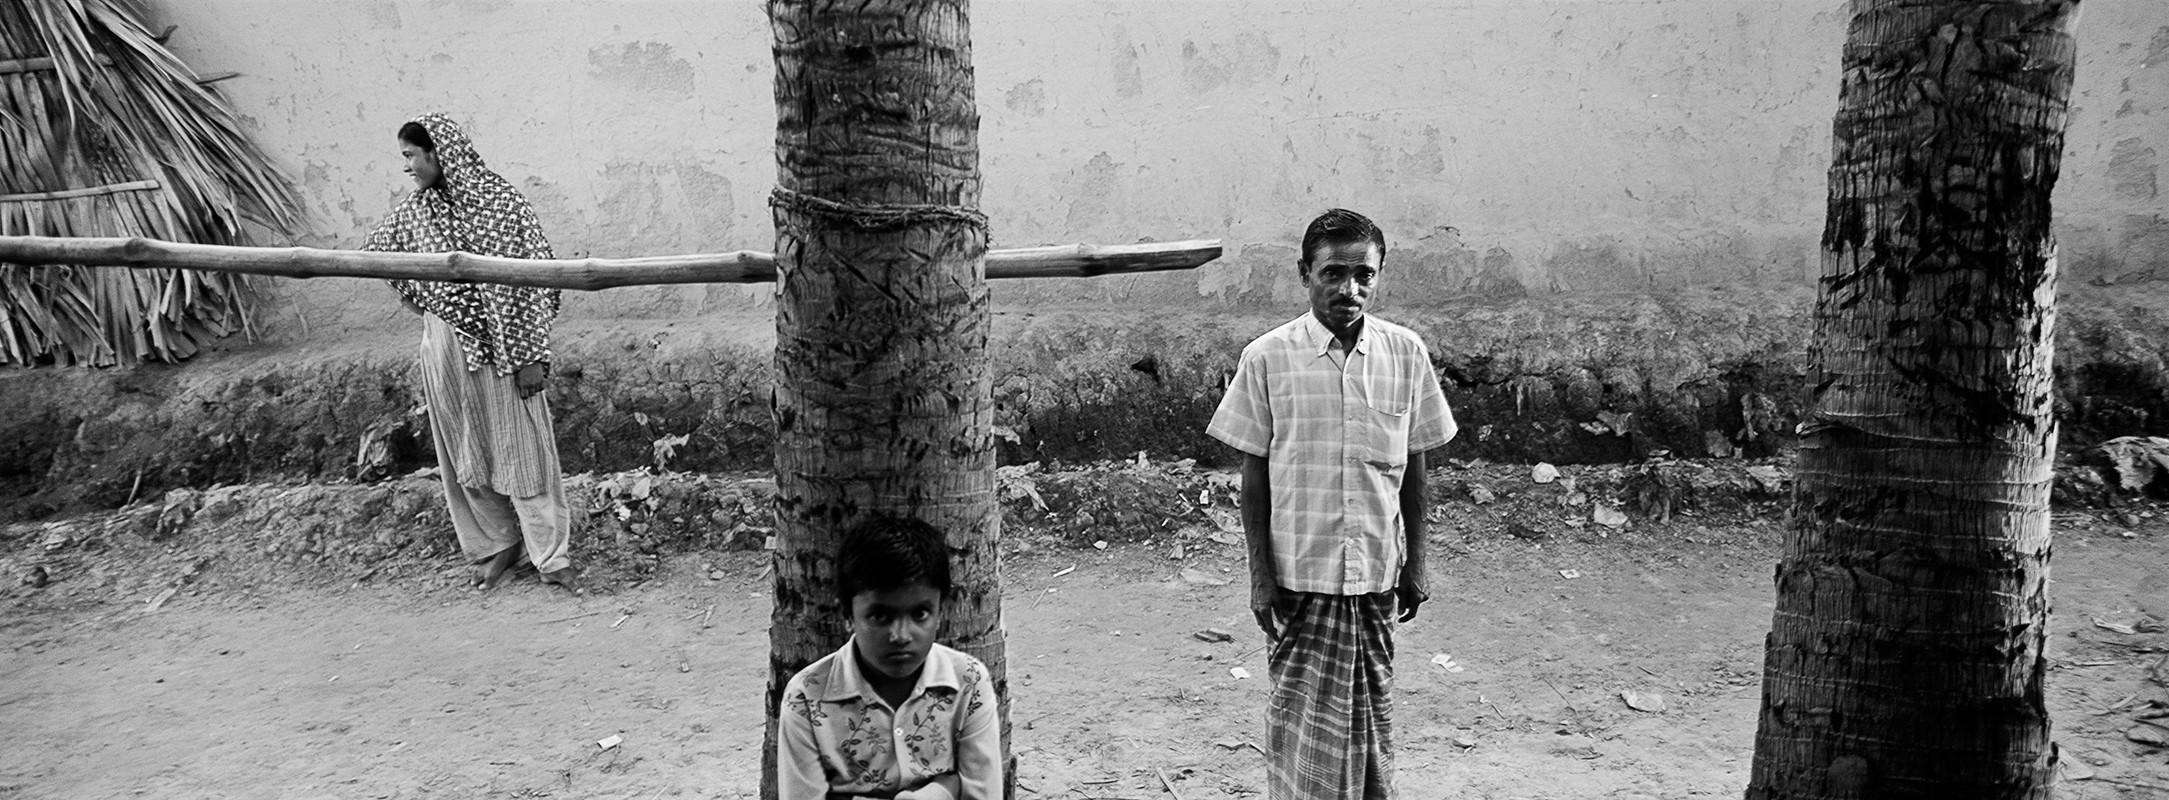 INDIA FENCE_07.jpg